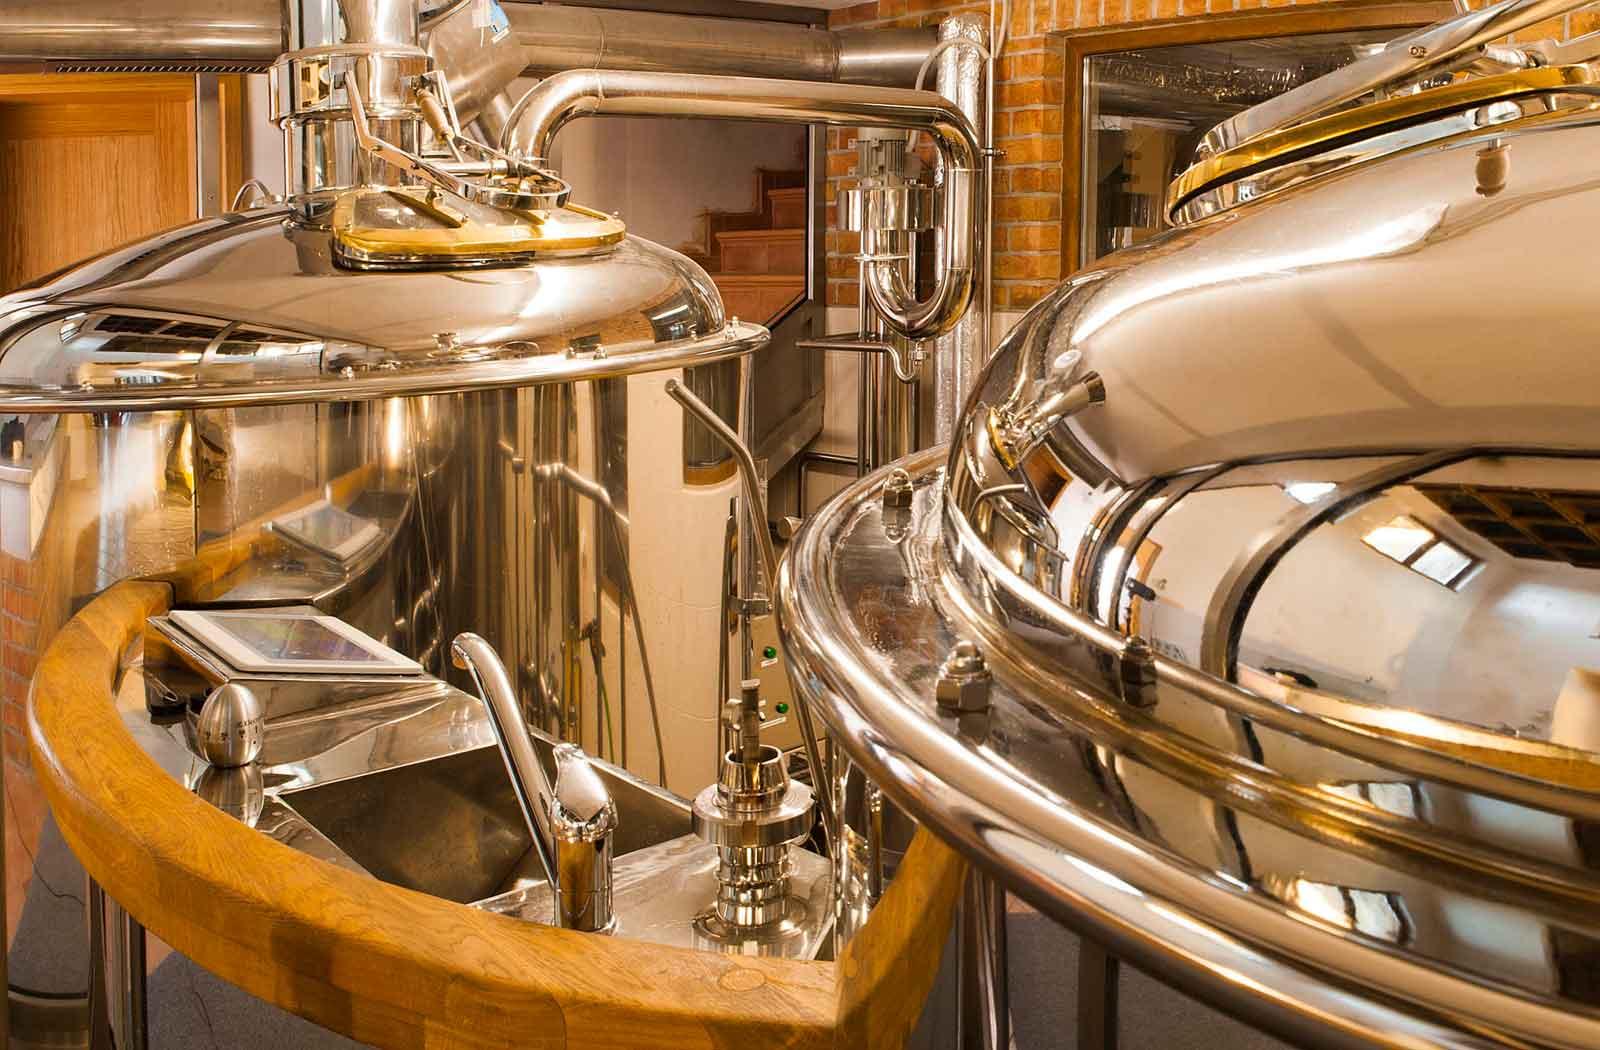 Beer production equipment